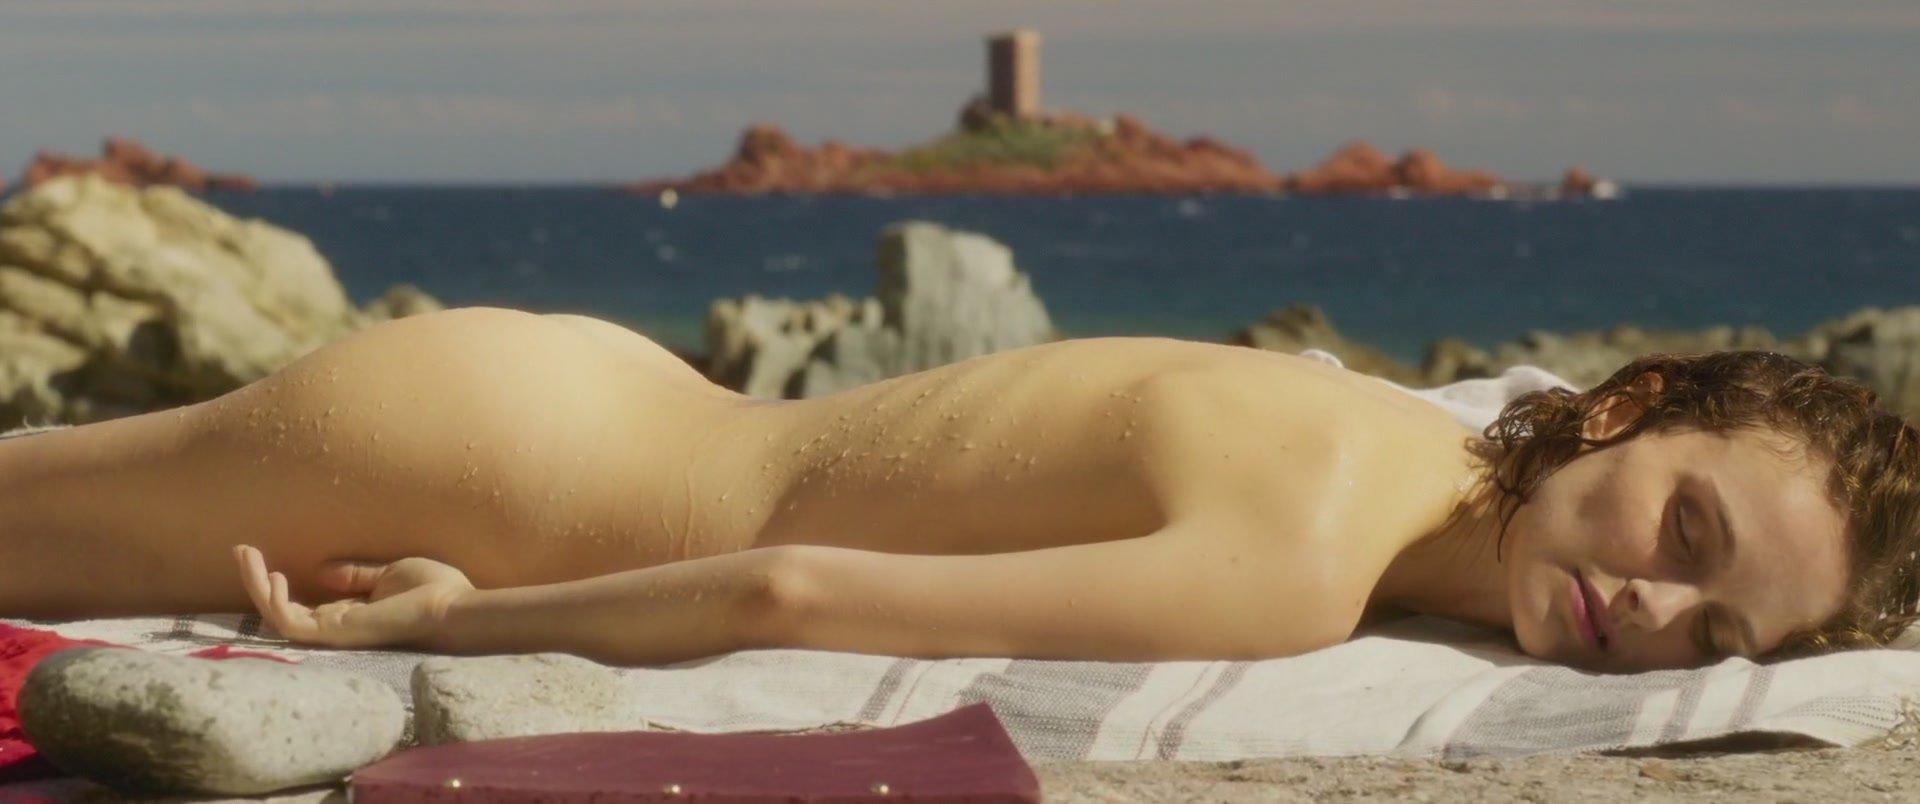 Natalie portman and hilary duff naked